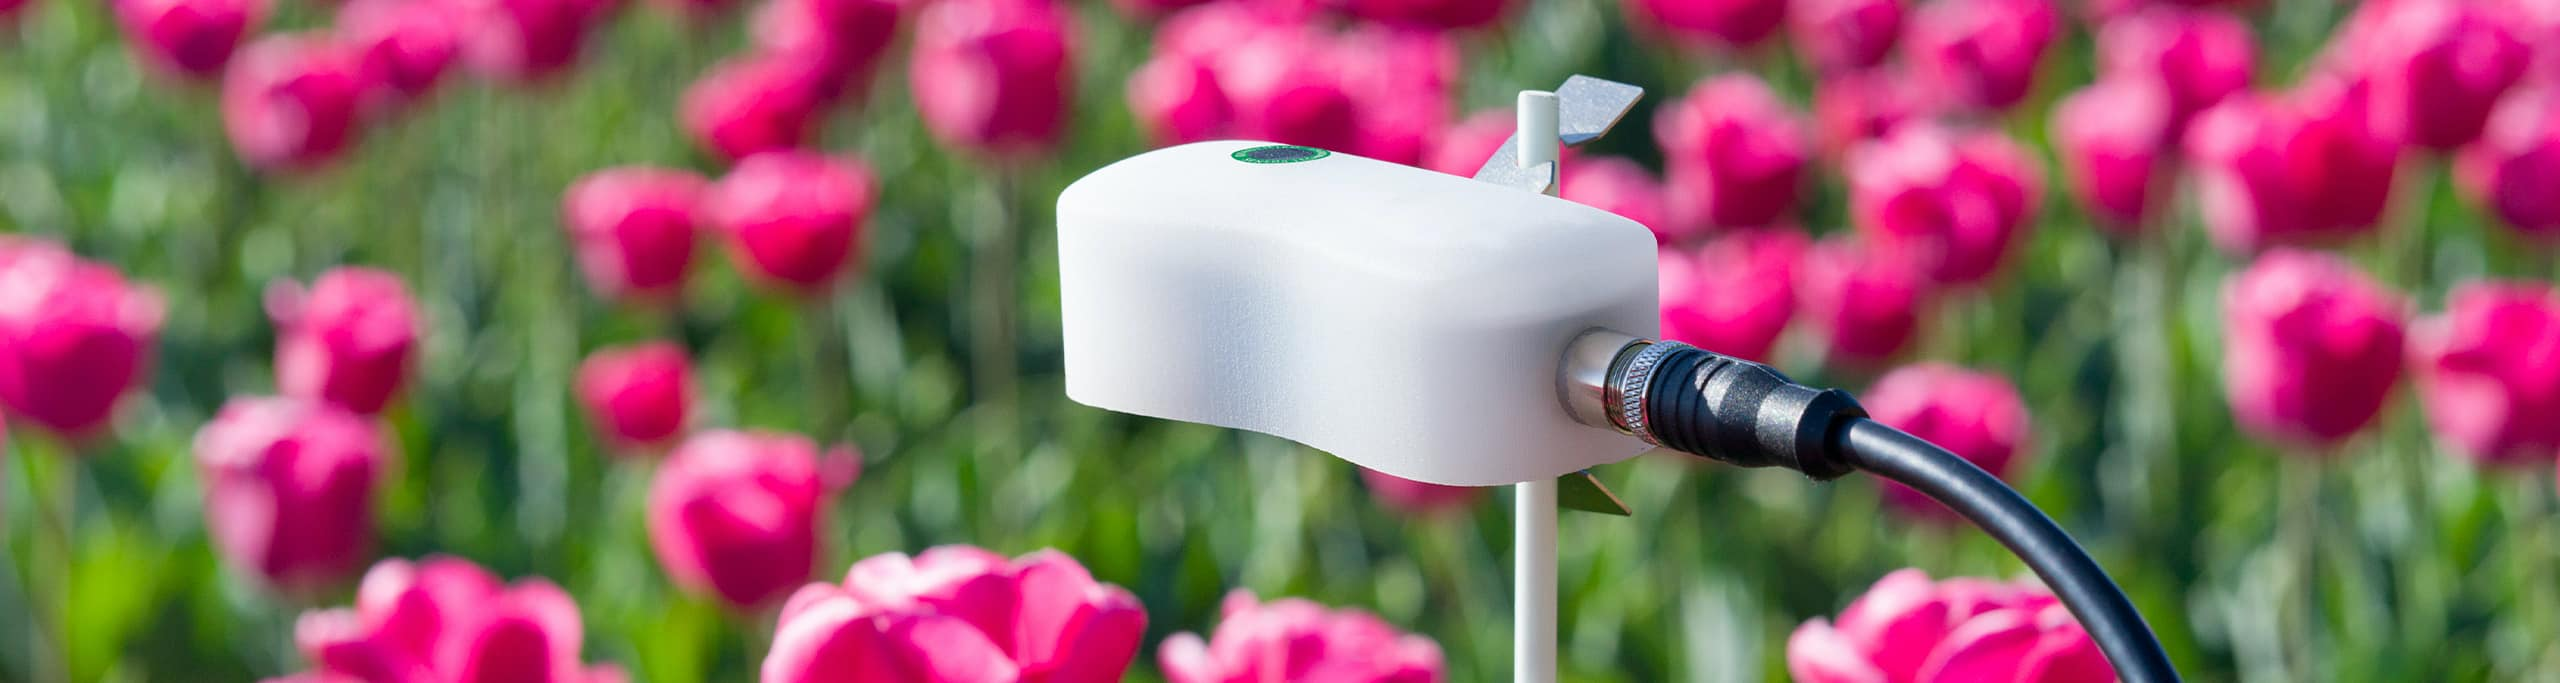 Hanno Groen & Joanna Boothman design Amsterdam Sensor for quantified